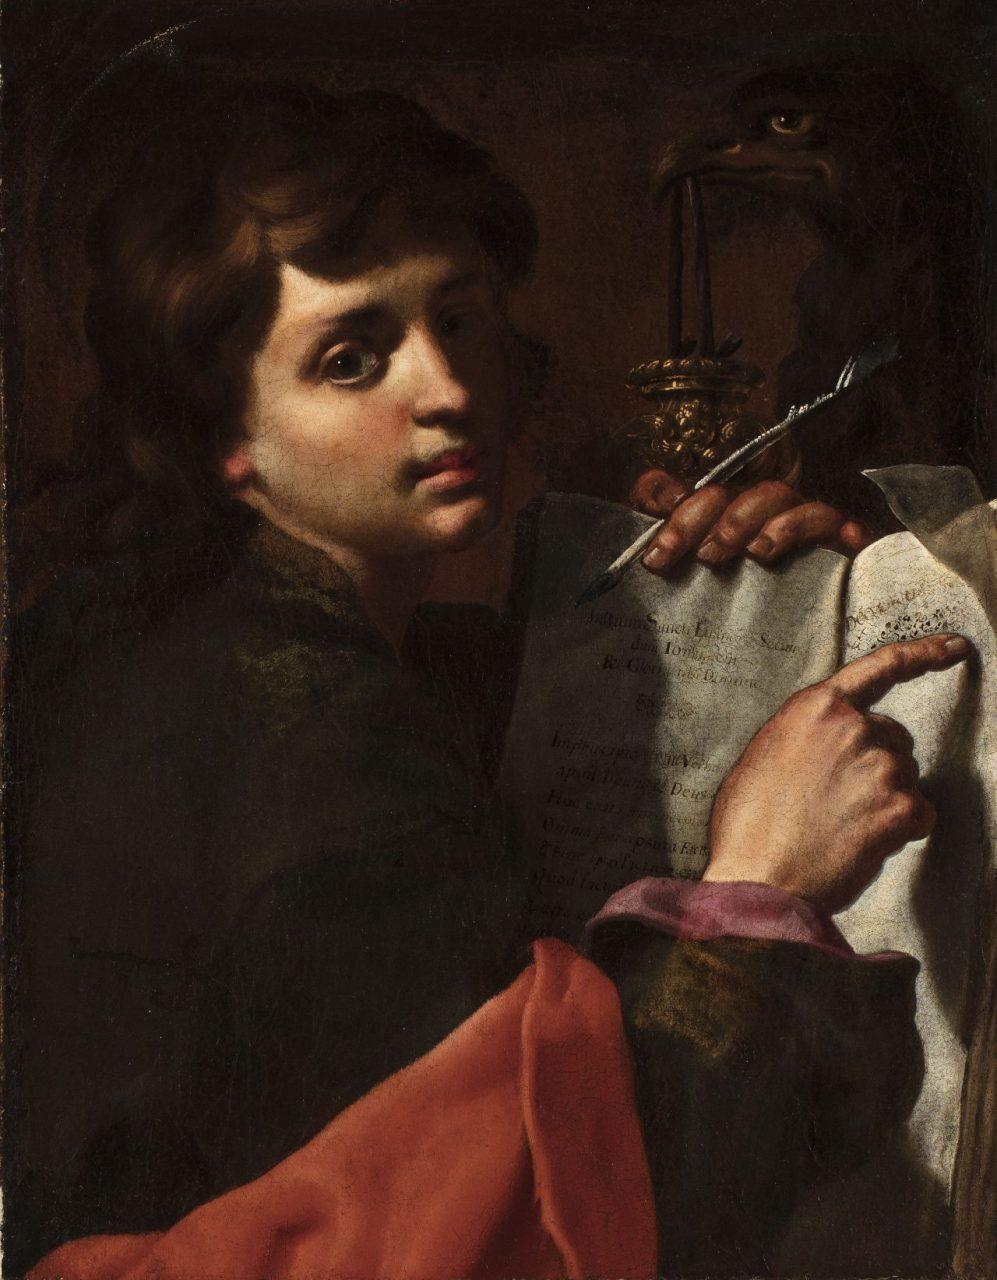 Sant Joan Evangelista, Alessandro Rosi